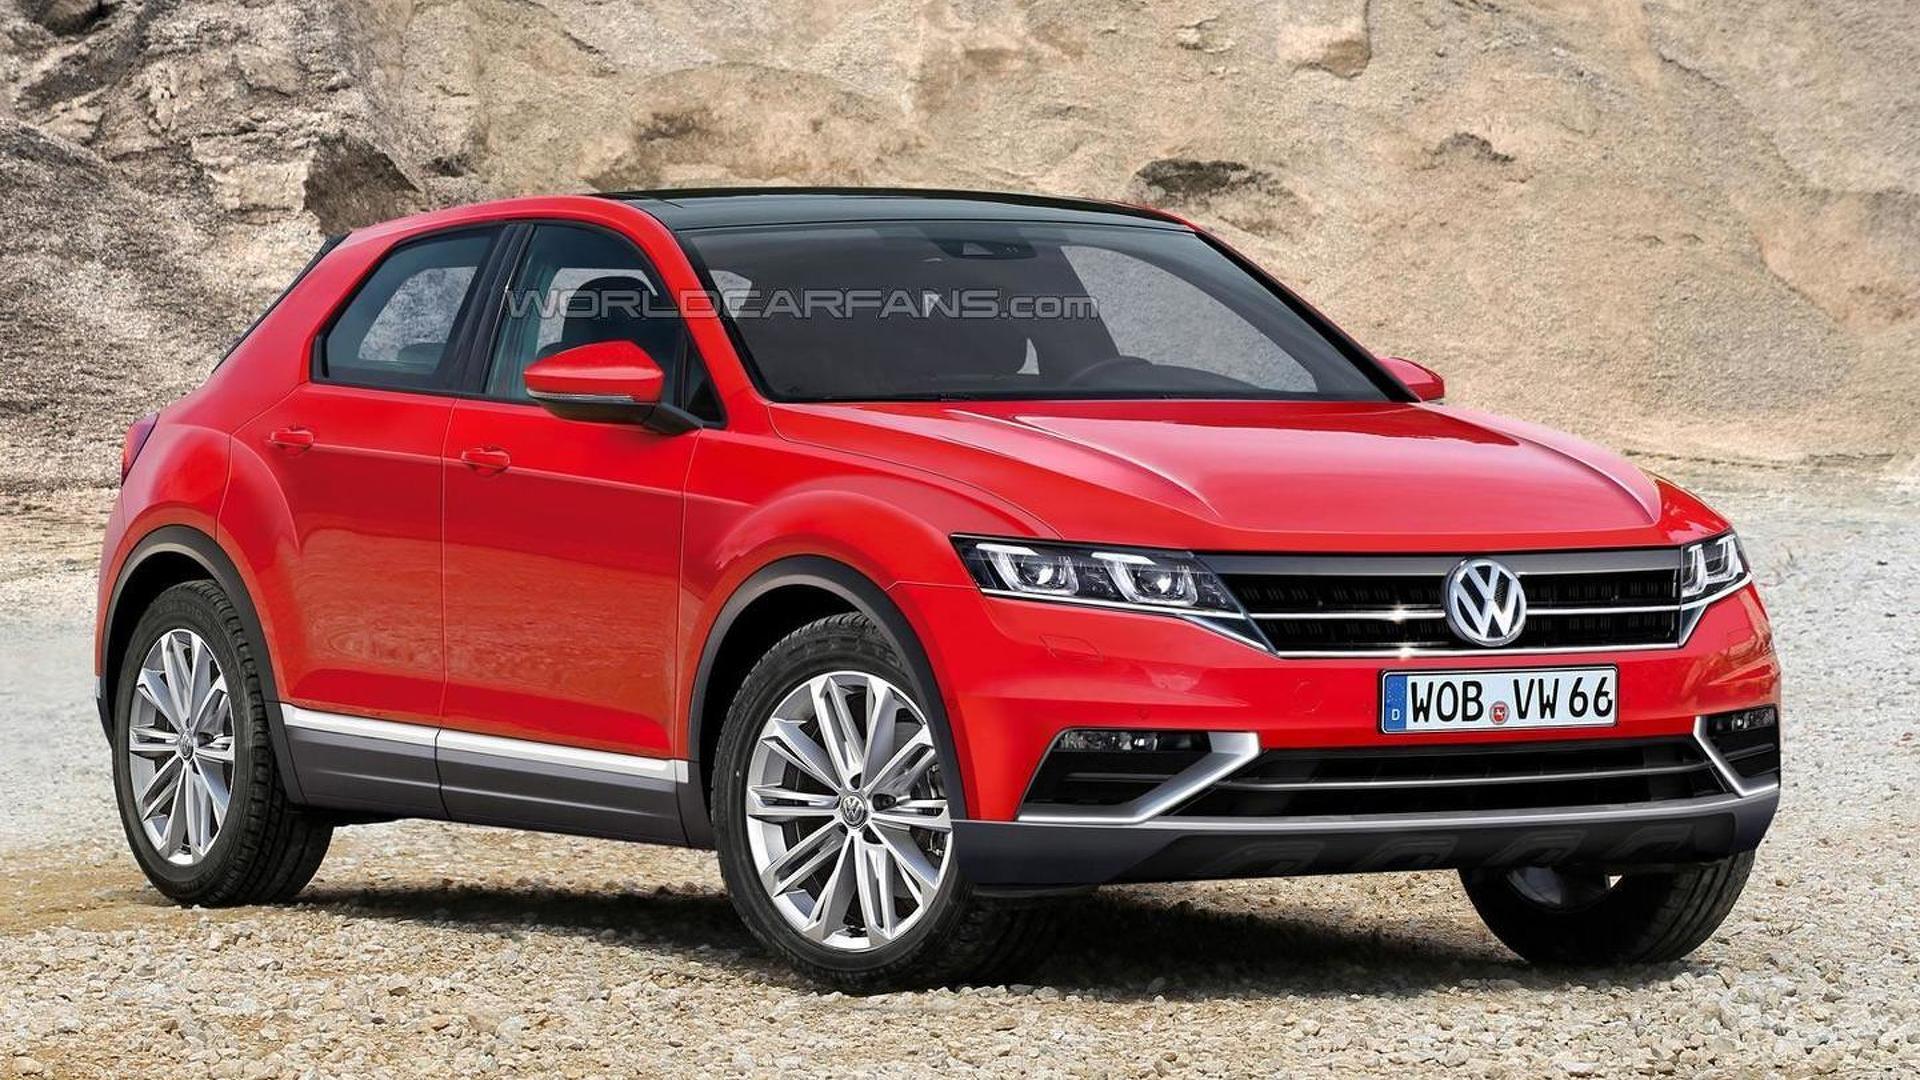 Volkswagen Polo-based crossover rendered to slot below Tiguan